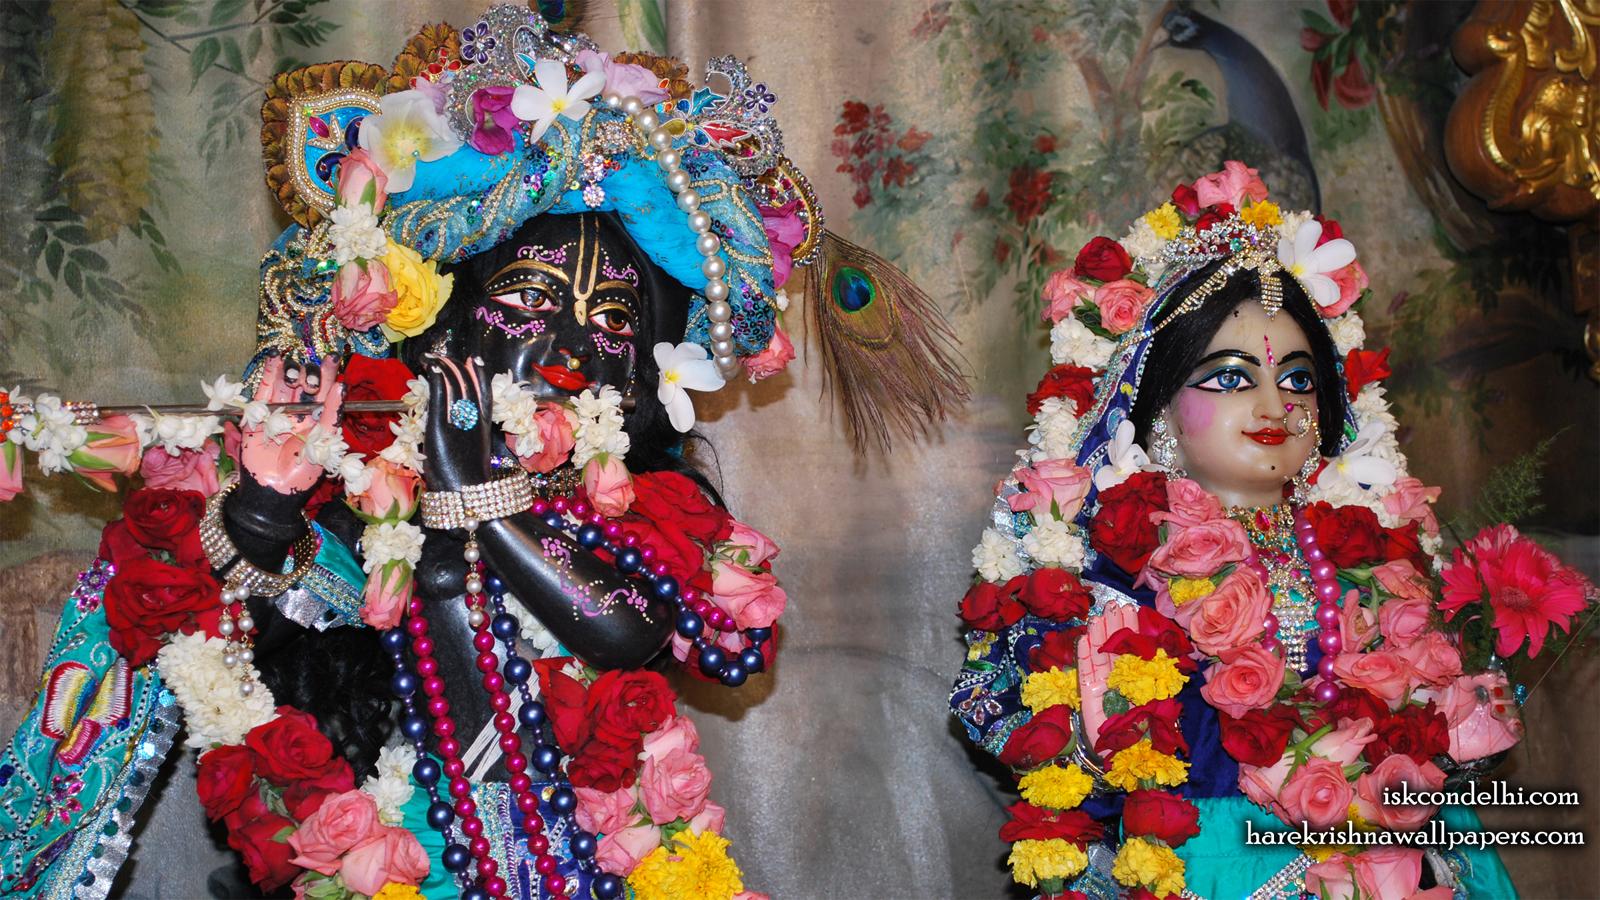 Sri Sri Radha Parthasarathi Close up Wallpaper (003) Size 1600x900 Download